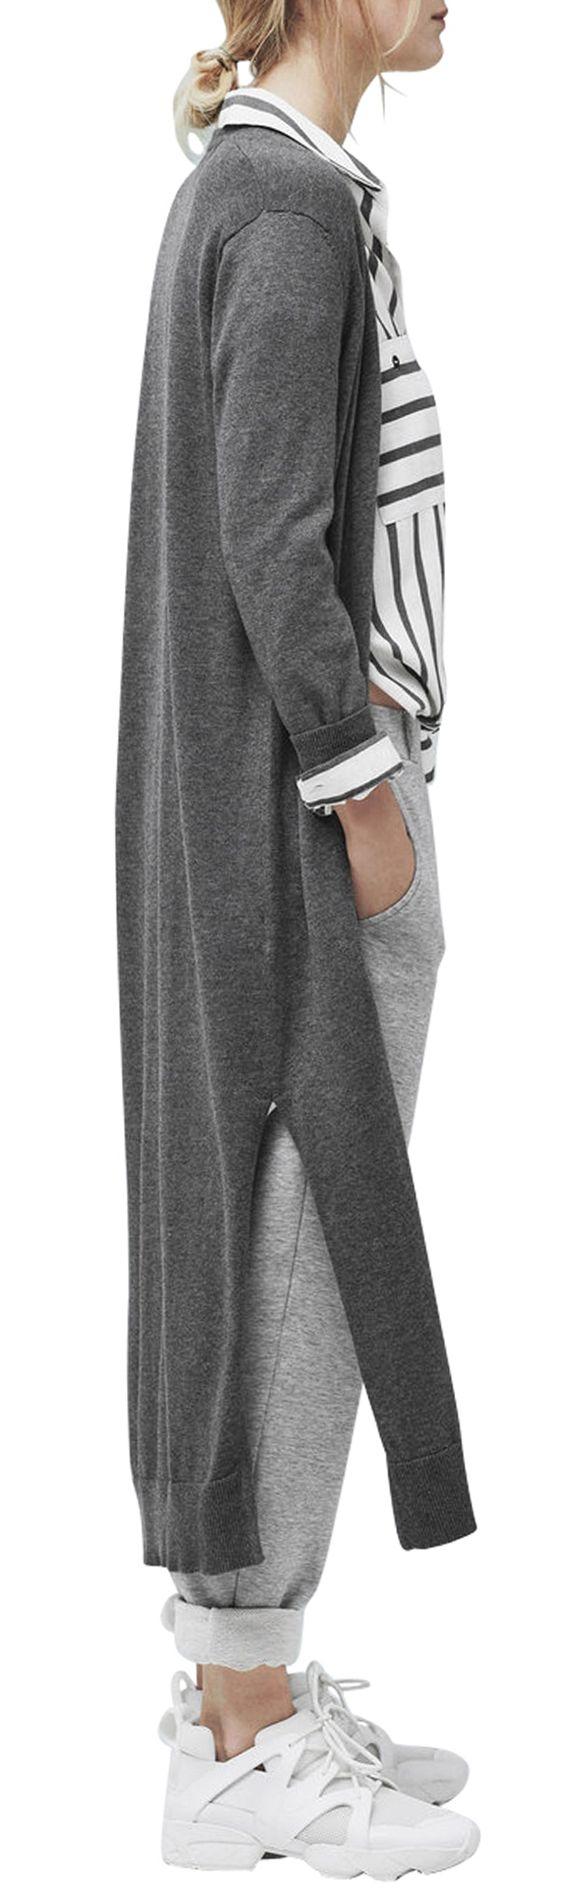 best 25 gilet long femme ideas on pinterest gilet femme long gilet long and tenues avec. Black Bedroom Furniture Sets. Home Design Ideas